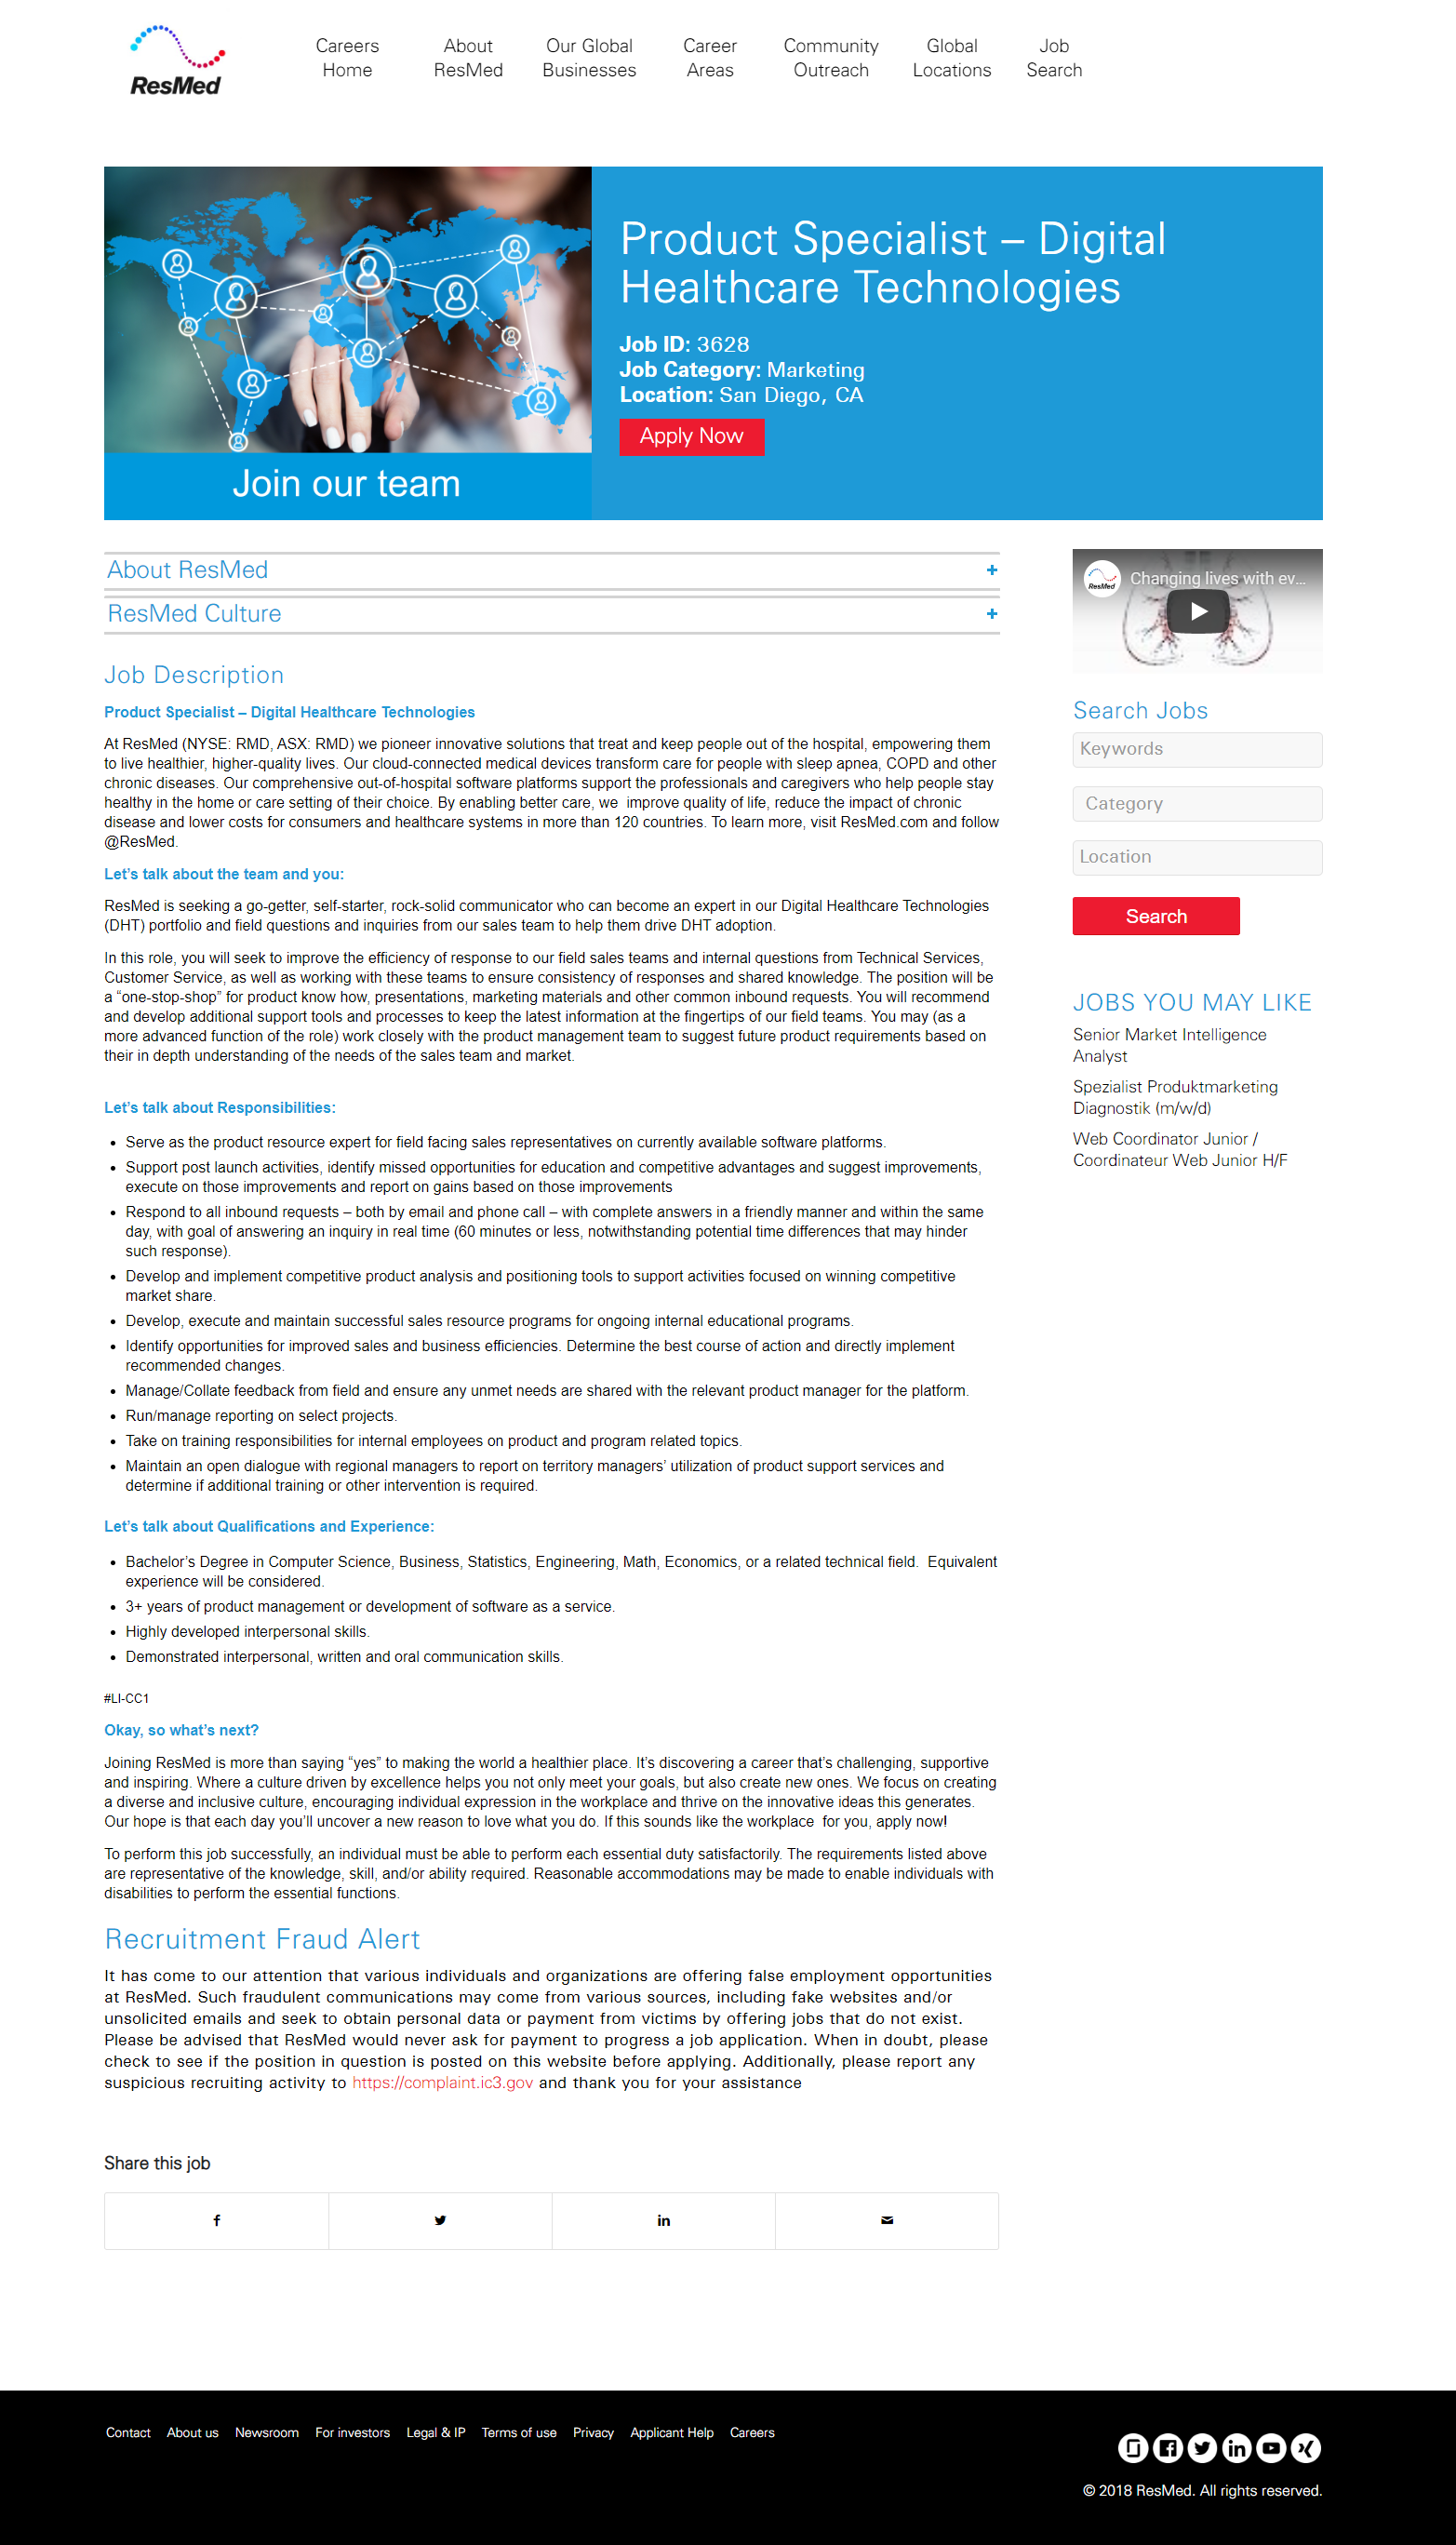 Cornerstone OnDemand job page overlay Resmed